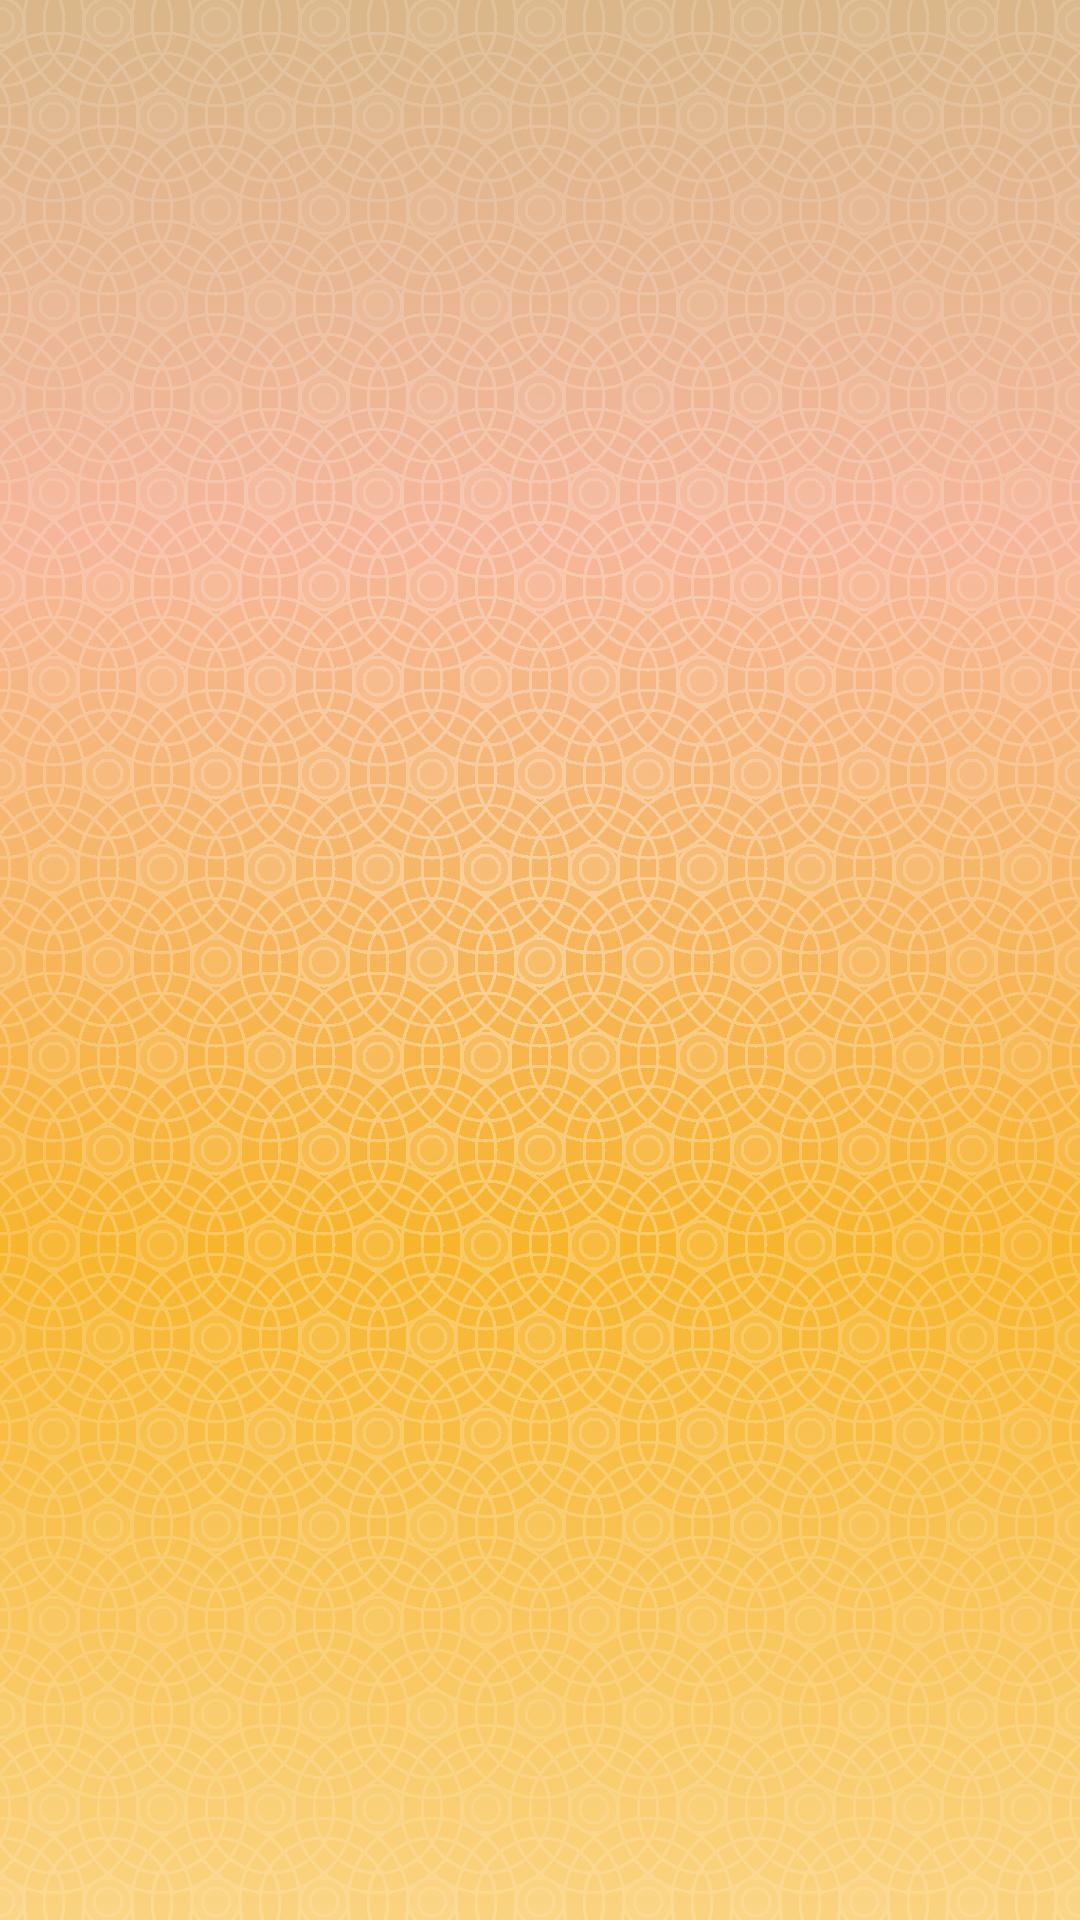 Wallpaper iphone kuning - Iphone 7 Plus Wallpaper